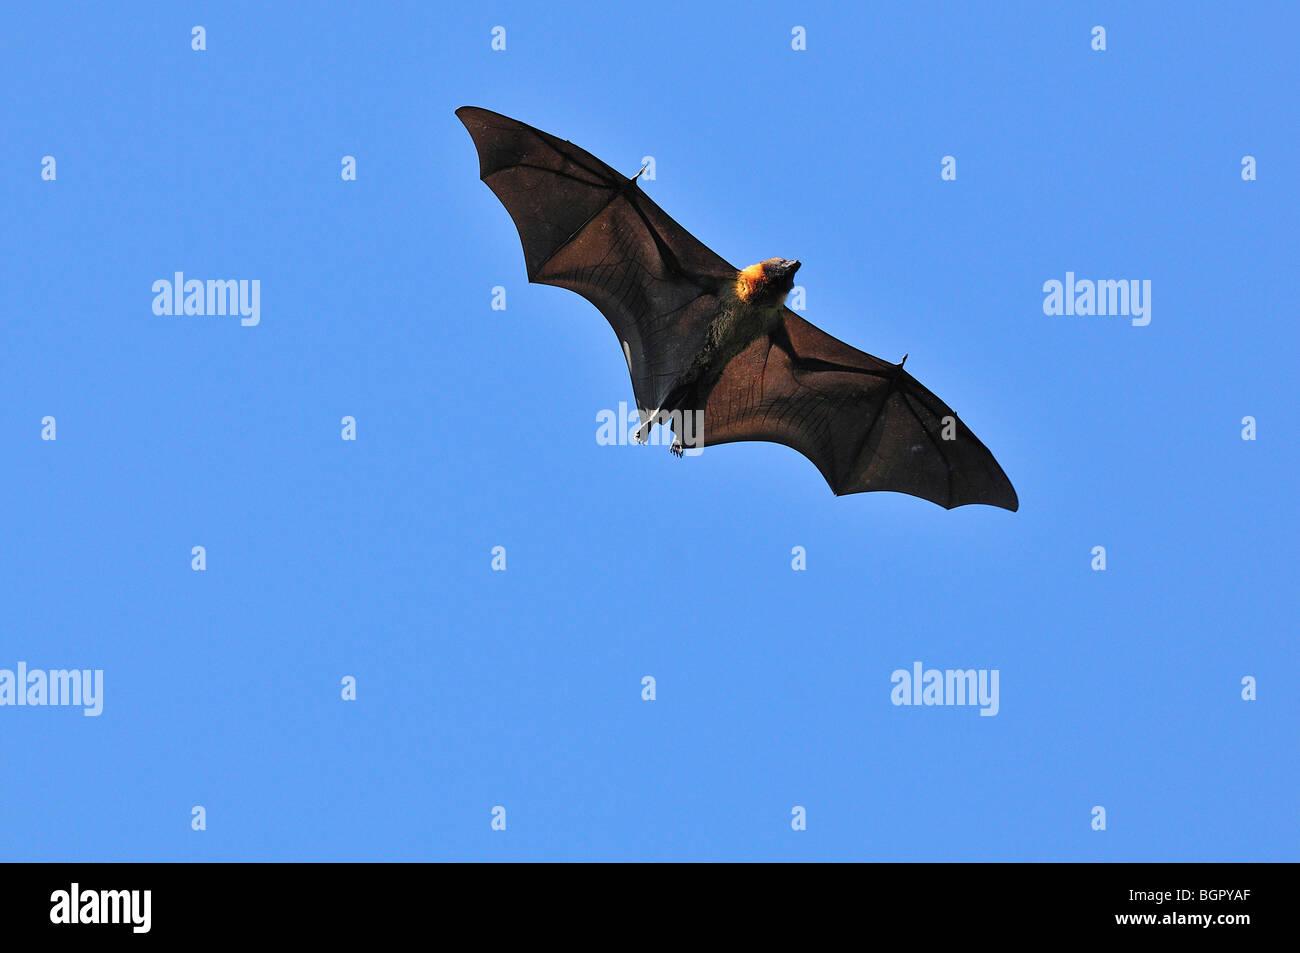 Madagascar Fruit Bat o Flying Fox (Pteropus rufus), adulto en vuelo, La Reserva Privada Berenty, Madagascar Foto de stock